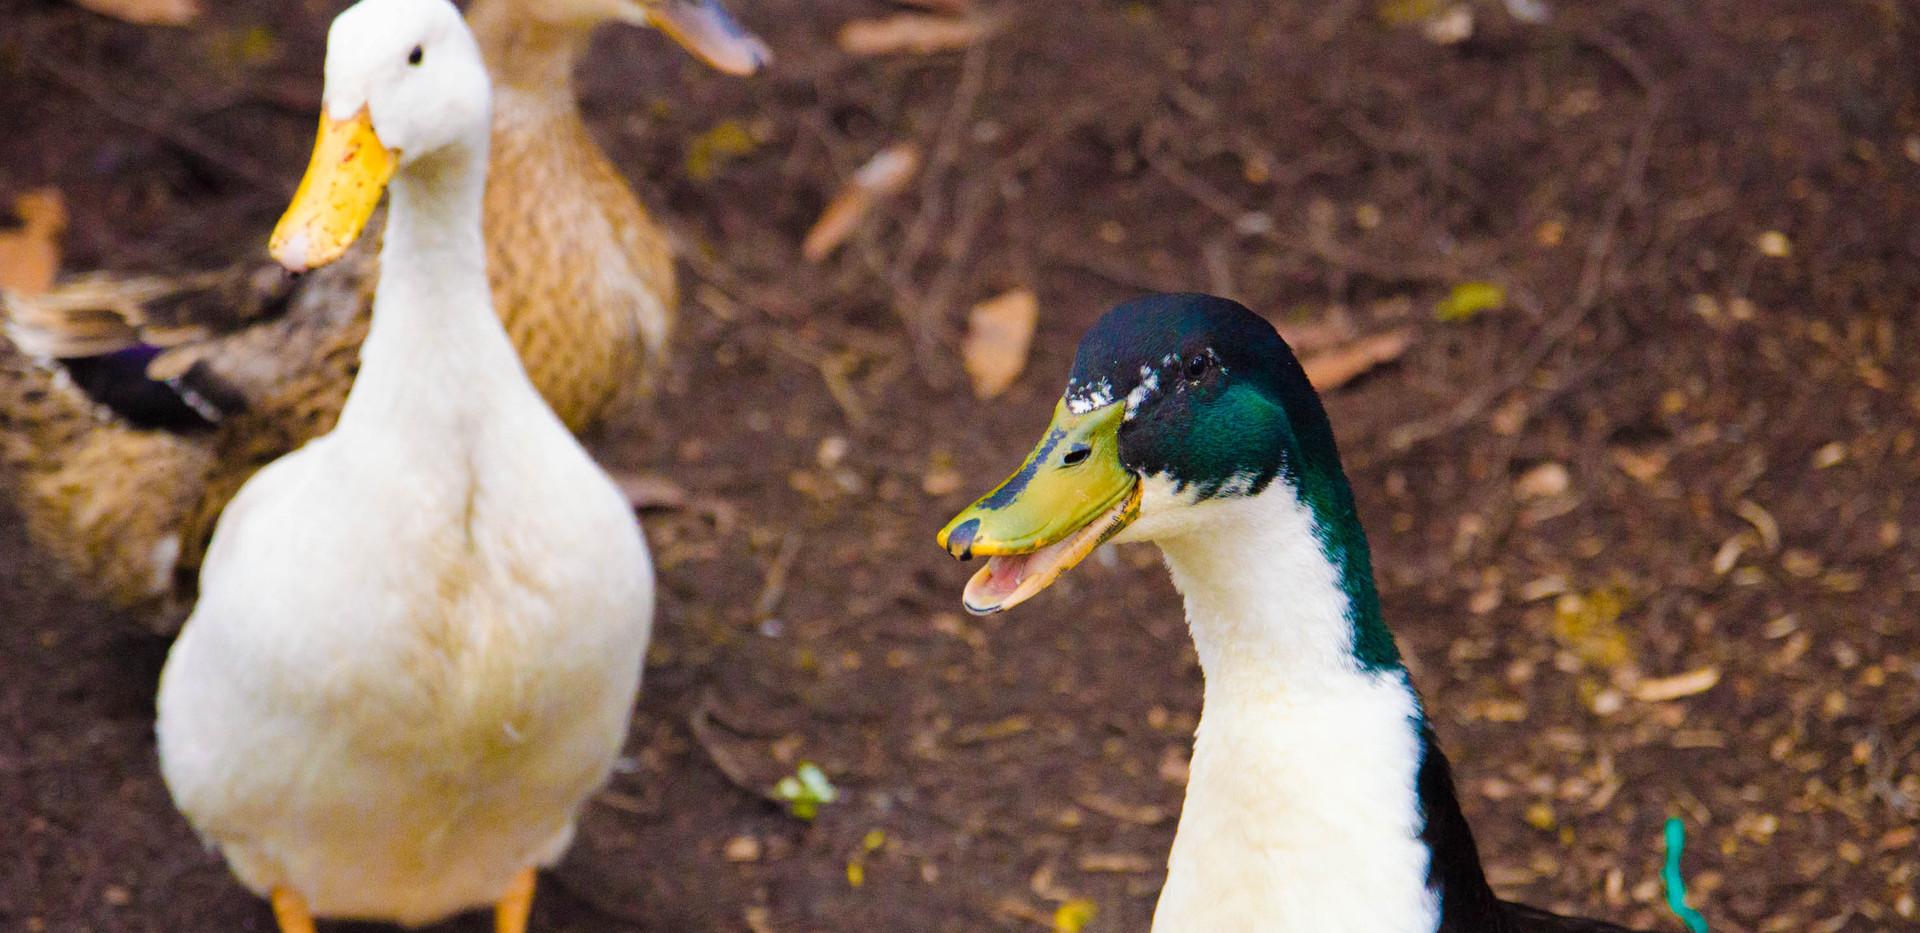 ducks glamping finca corazon.jpg